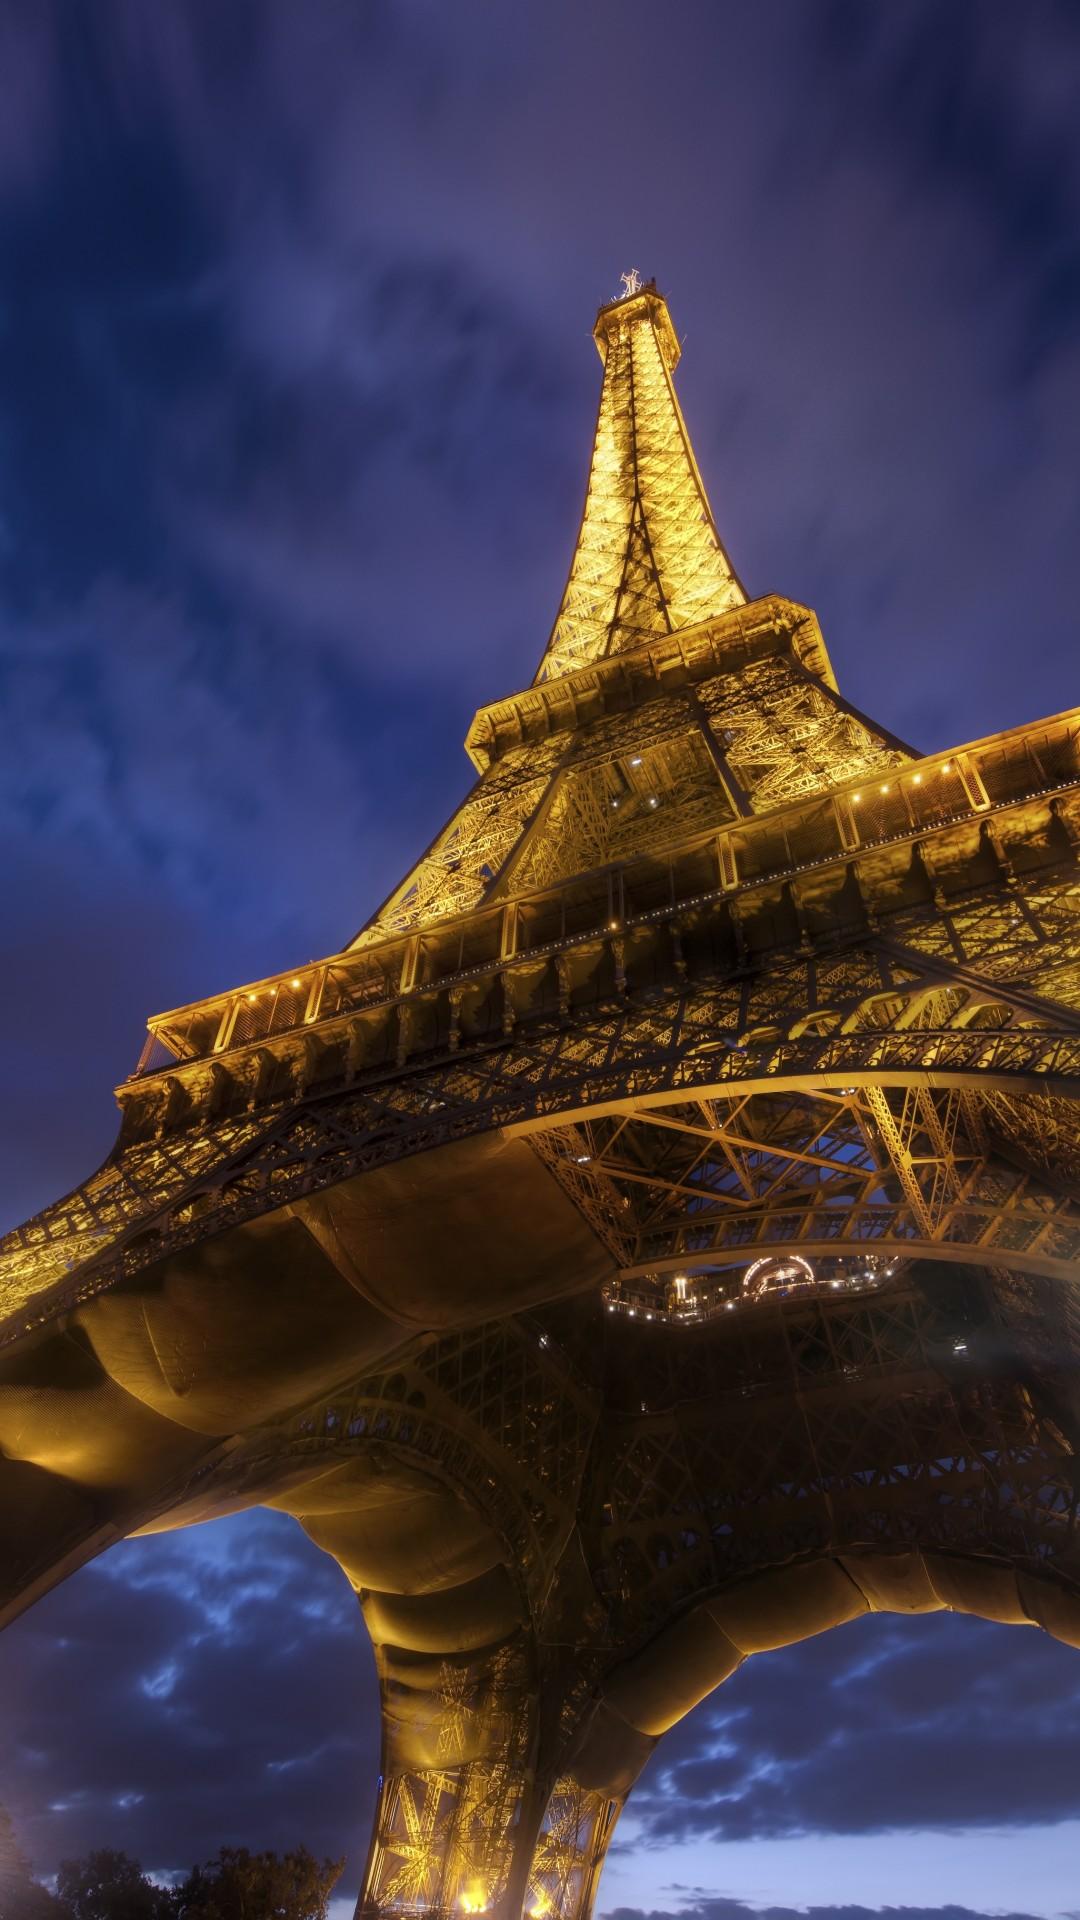 eiffel-tower-1080x1920-paris-france-travel-tourism-5398.jpg